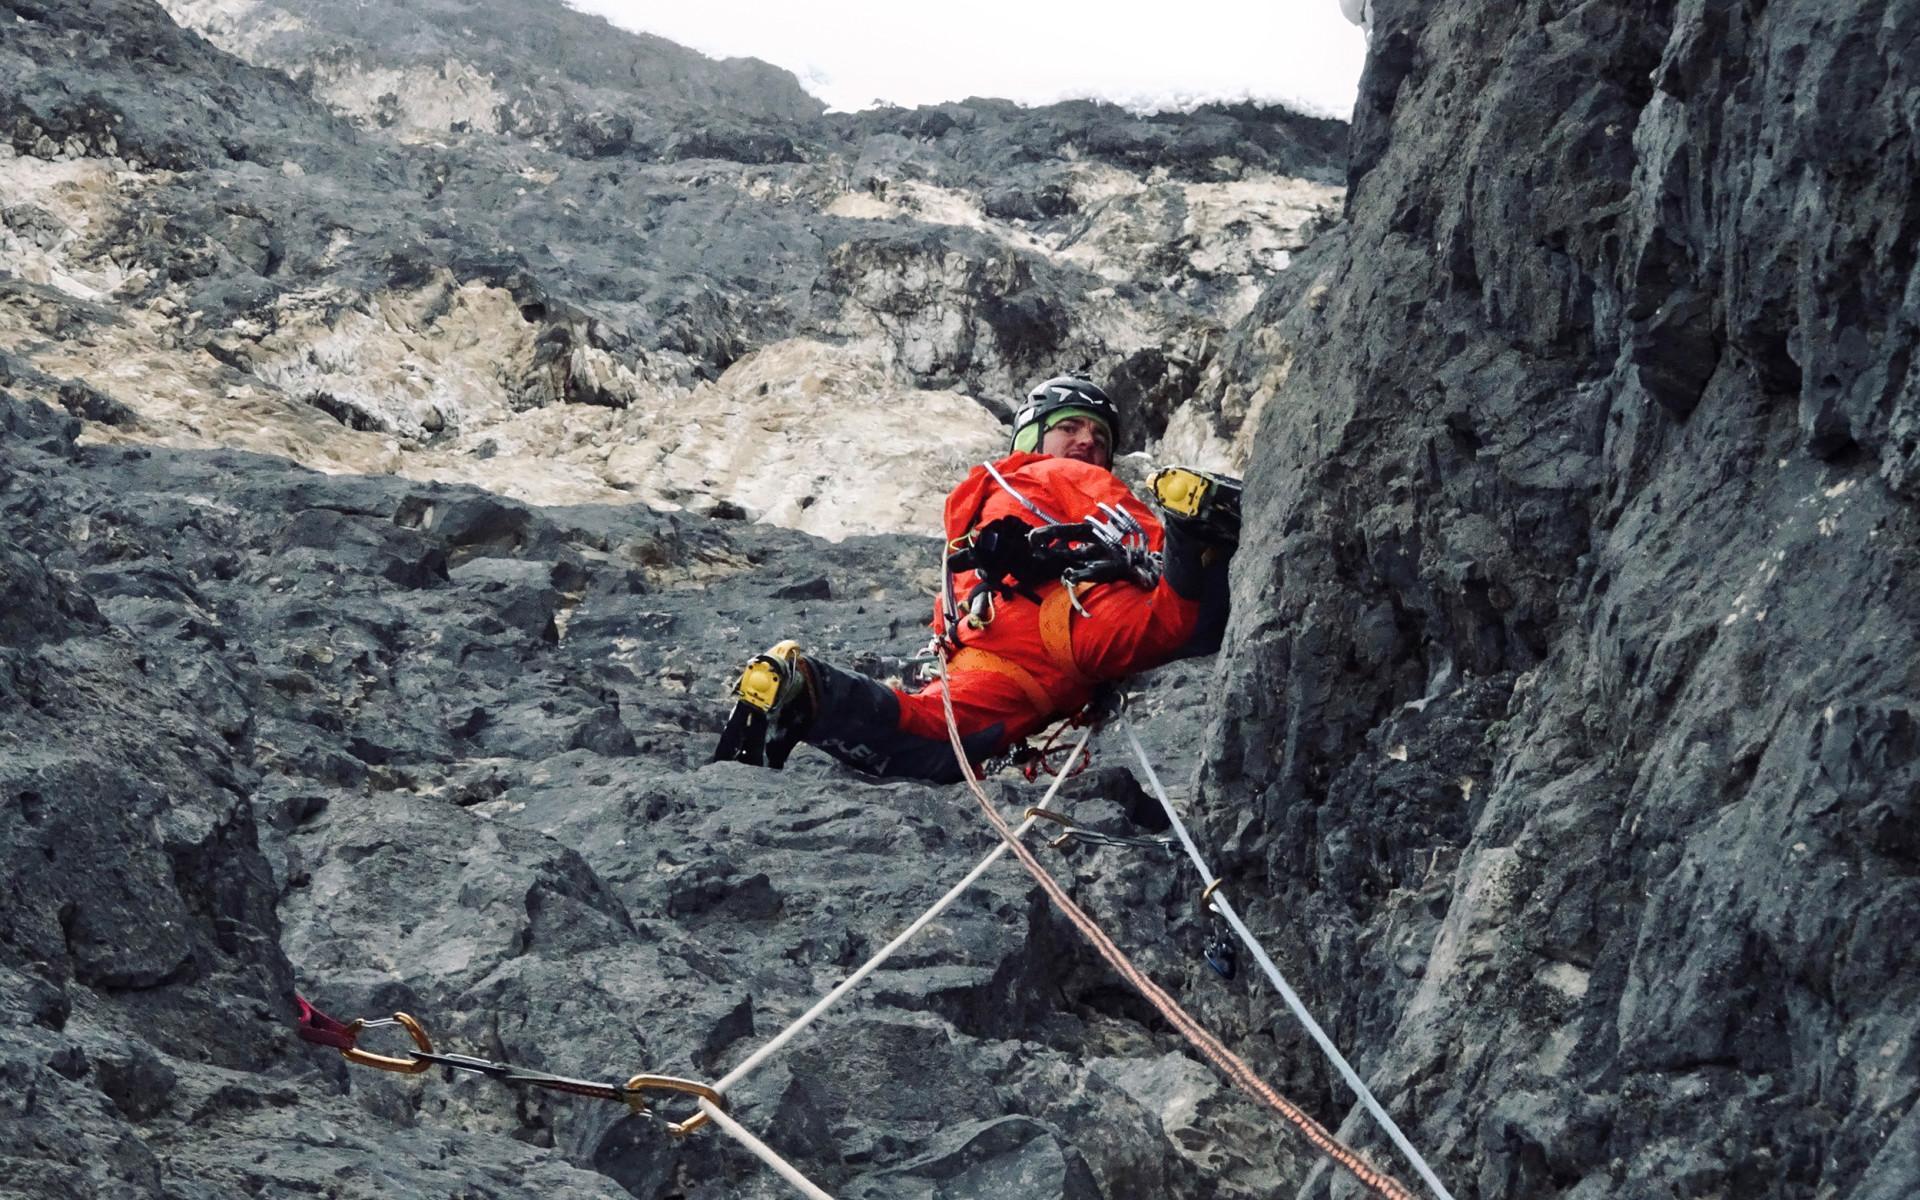 """In sum it was quite an adventurous undertaking in wild, alpine surroundings"", raved Simon Gietl."